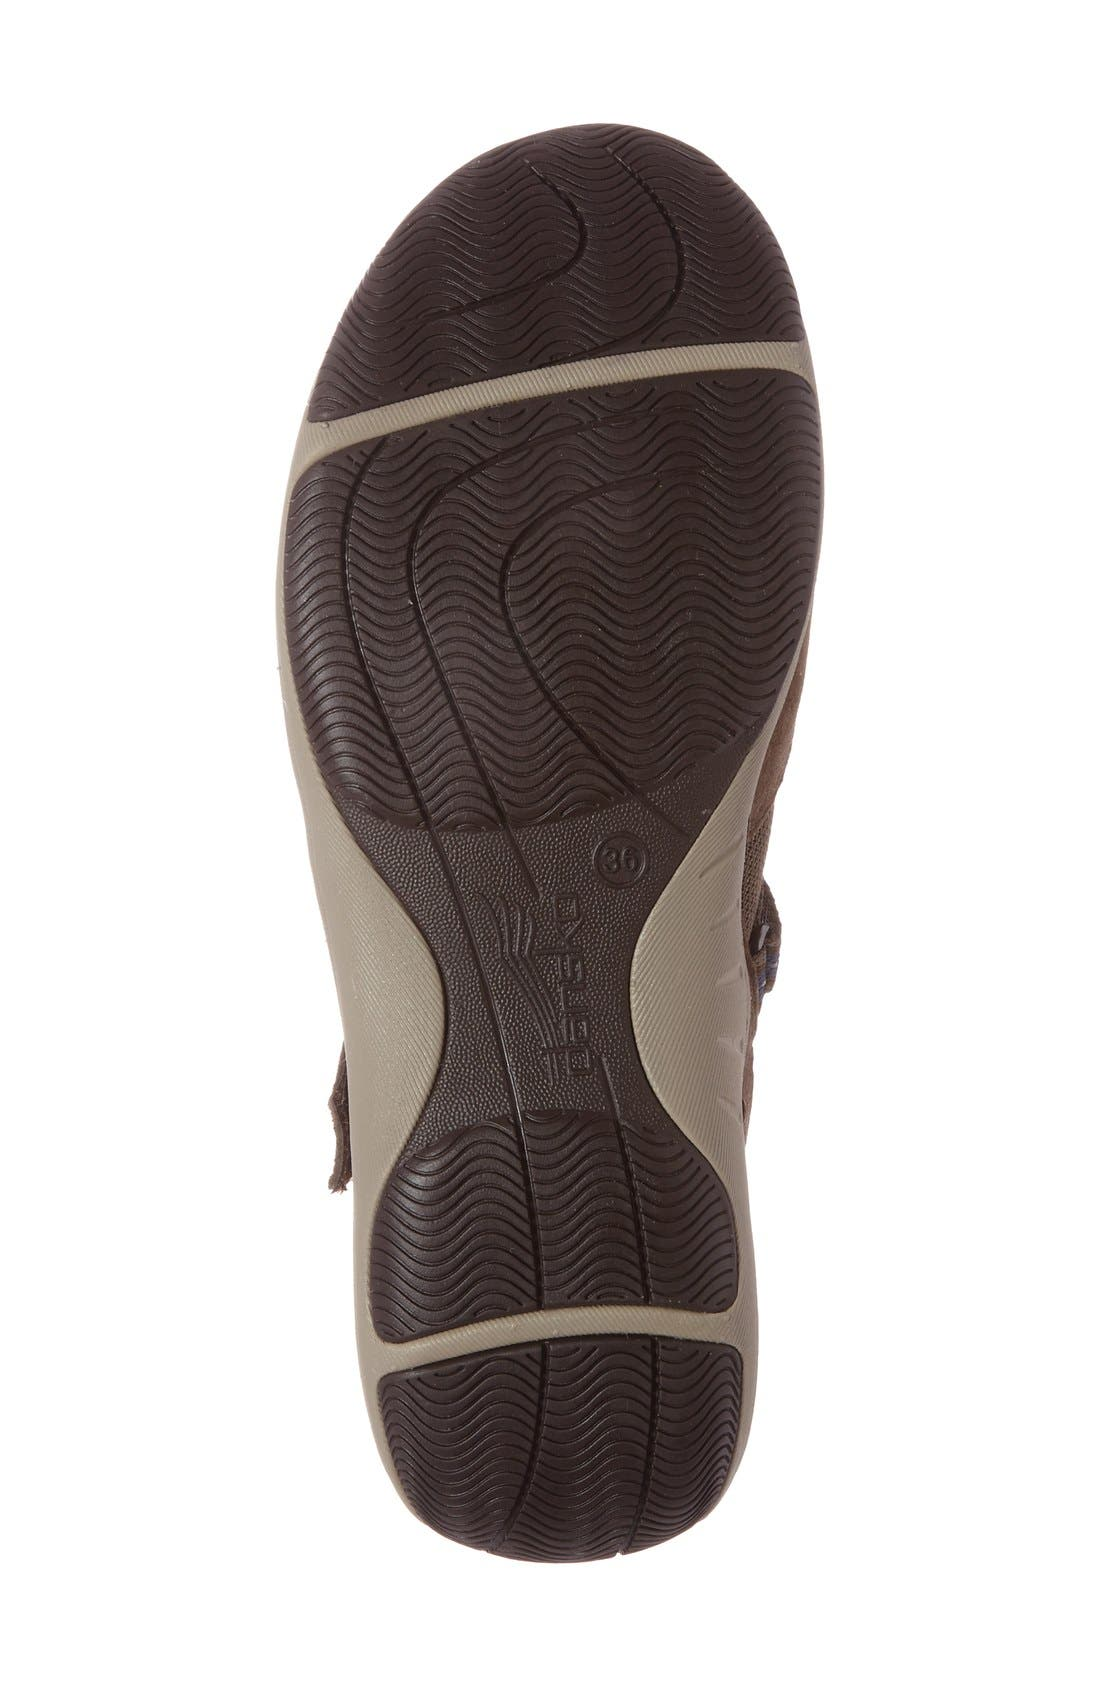 'Hazel' Slip-On Sneaker,                             Alternate thumbnail 5, color,                             Taupe Suede